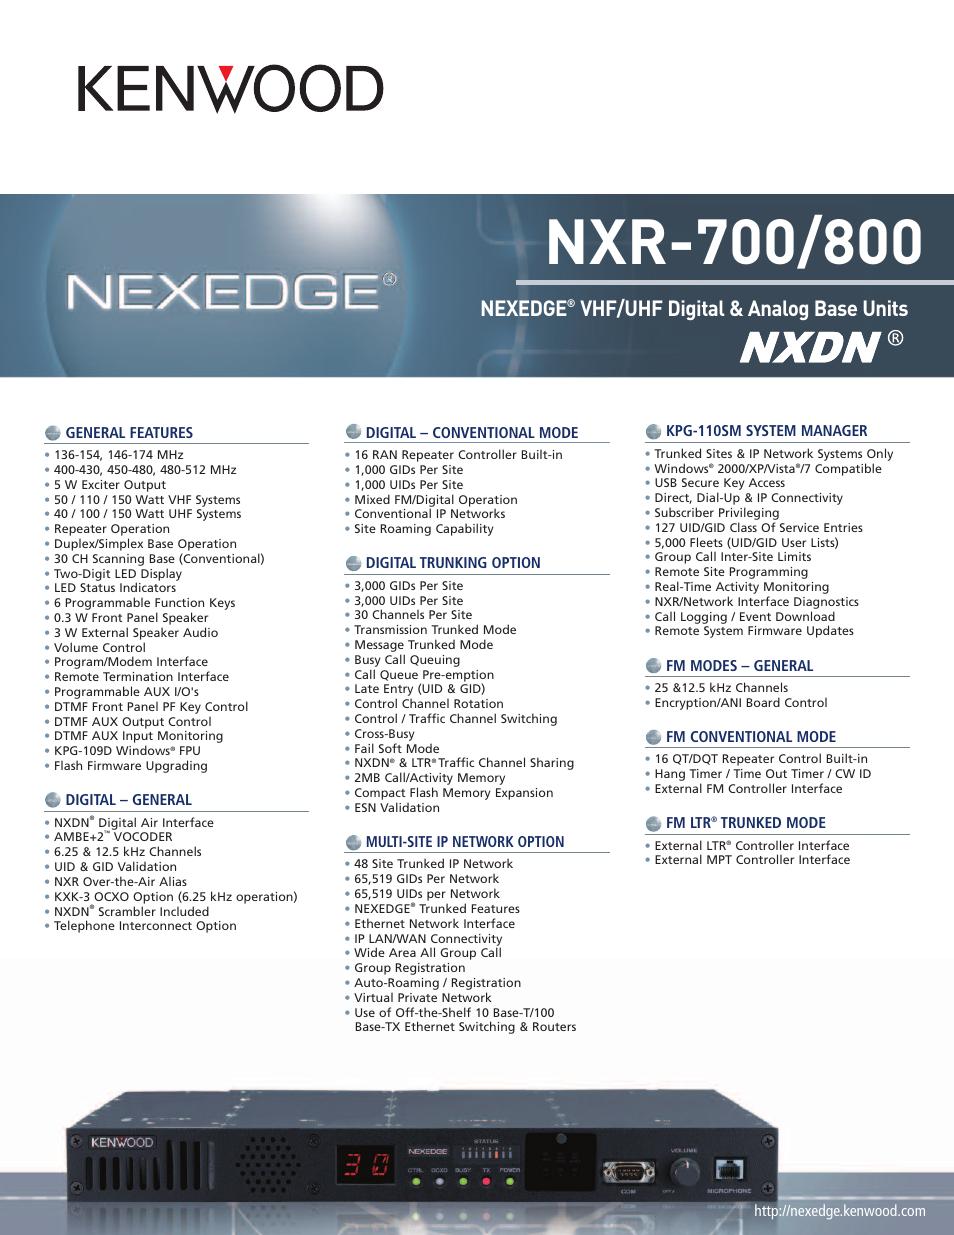 Kenwood NXR-700/800 User Manual | 2 pages